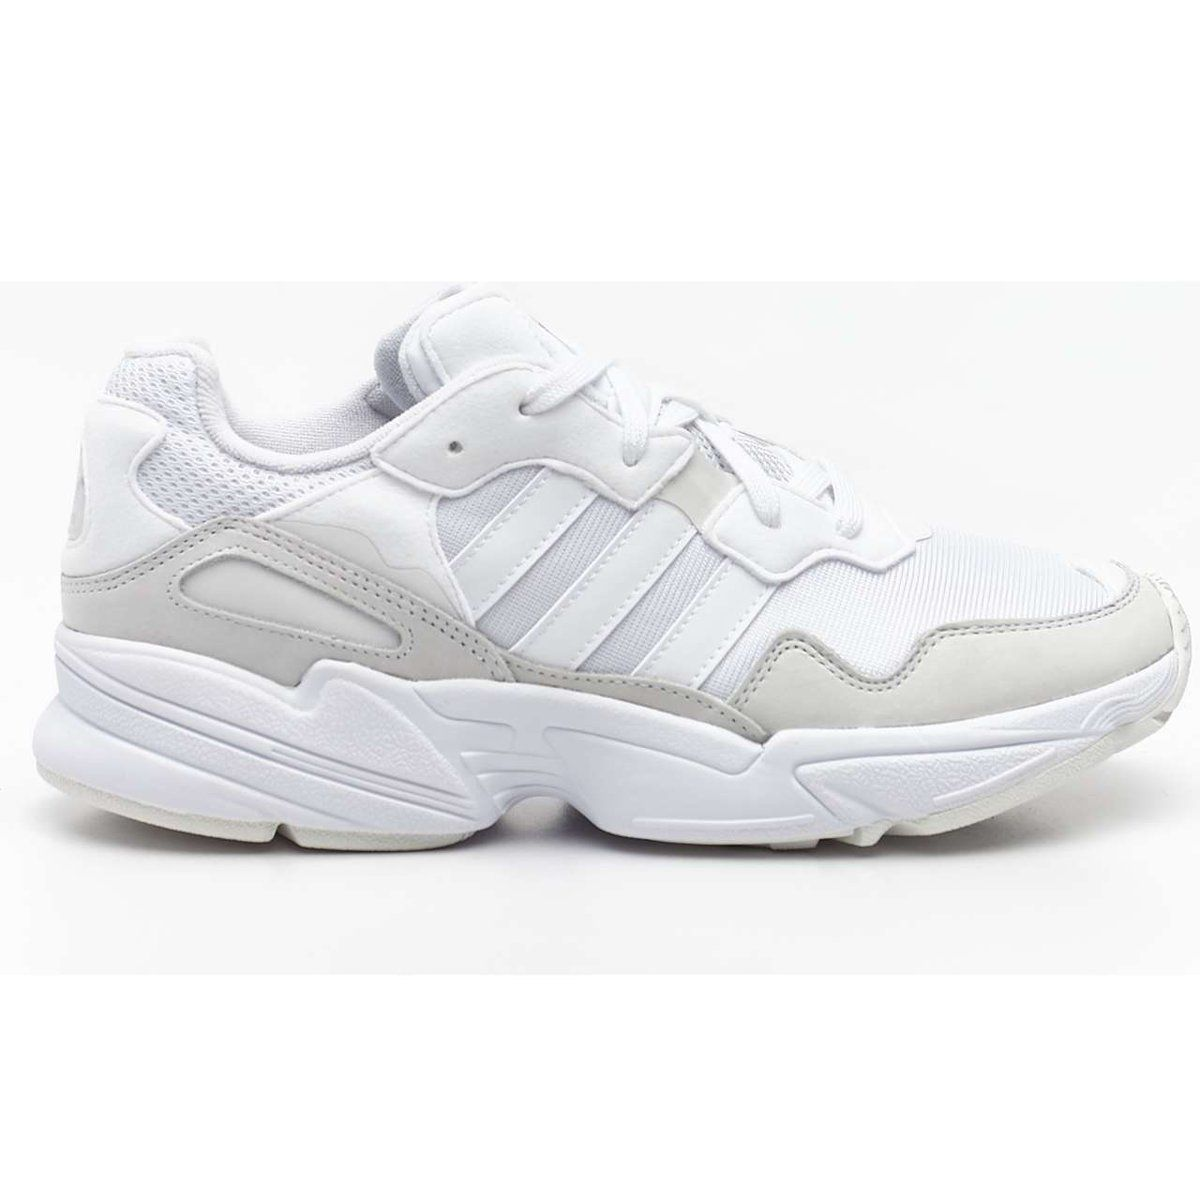 Sportowe Meskie Adidas Adidas Biale Yung 96 Footwear White Footwear White Grey Two Footwear Shoes Adidas